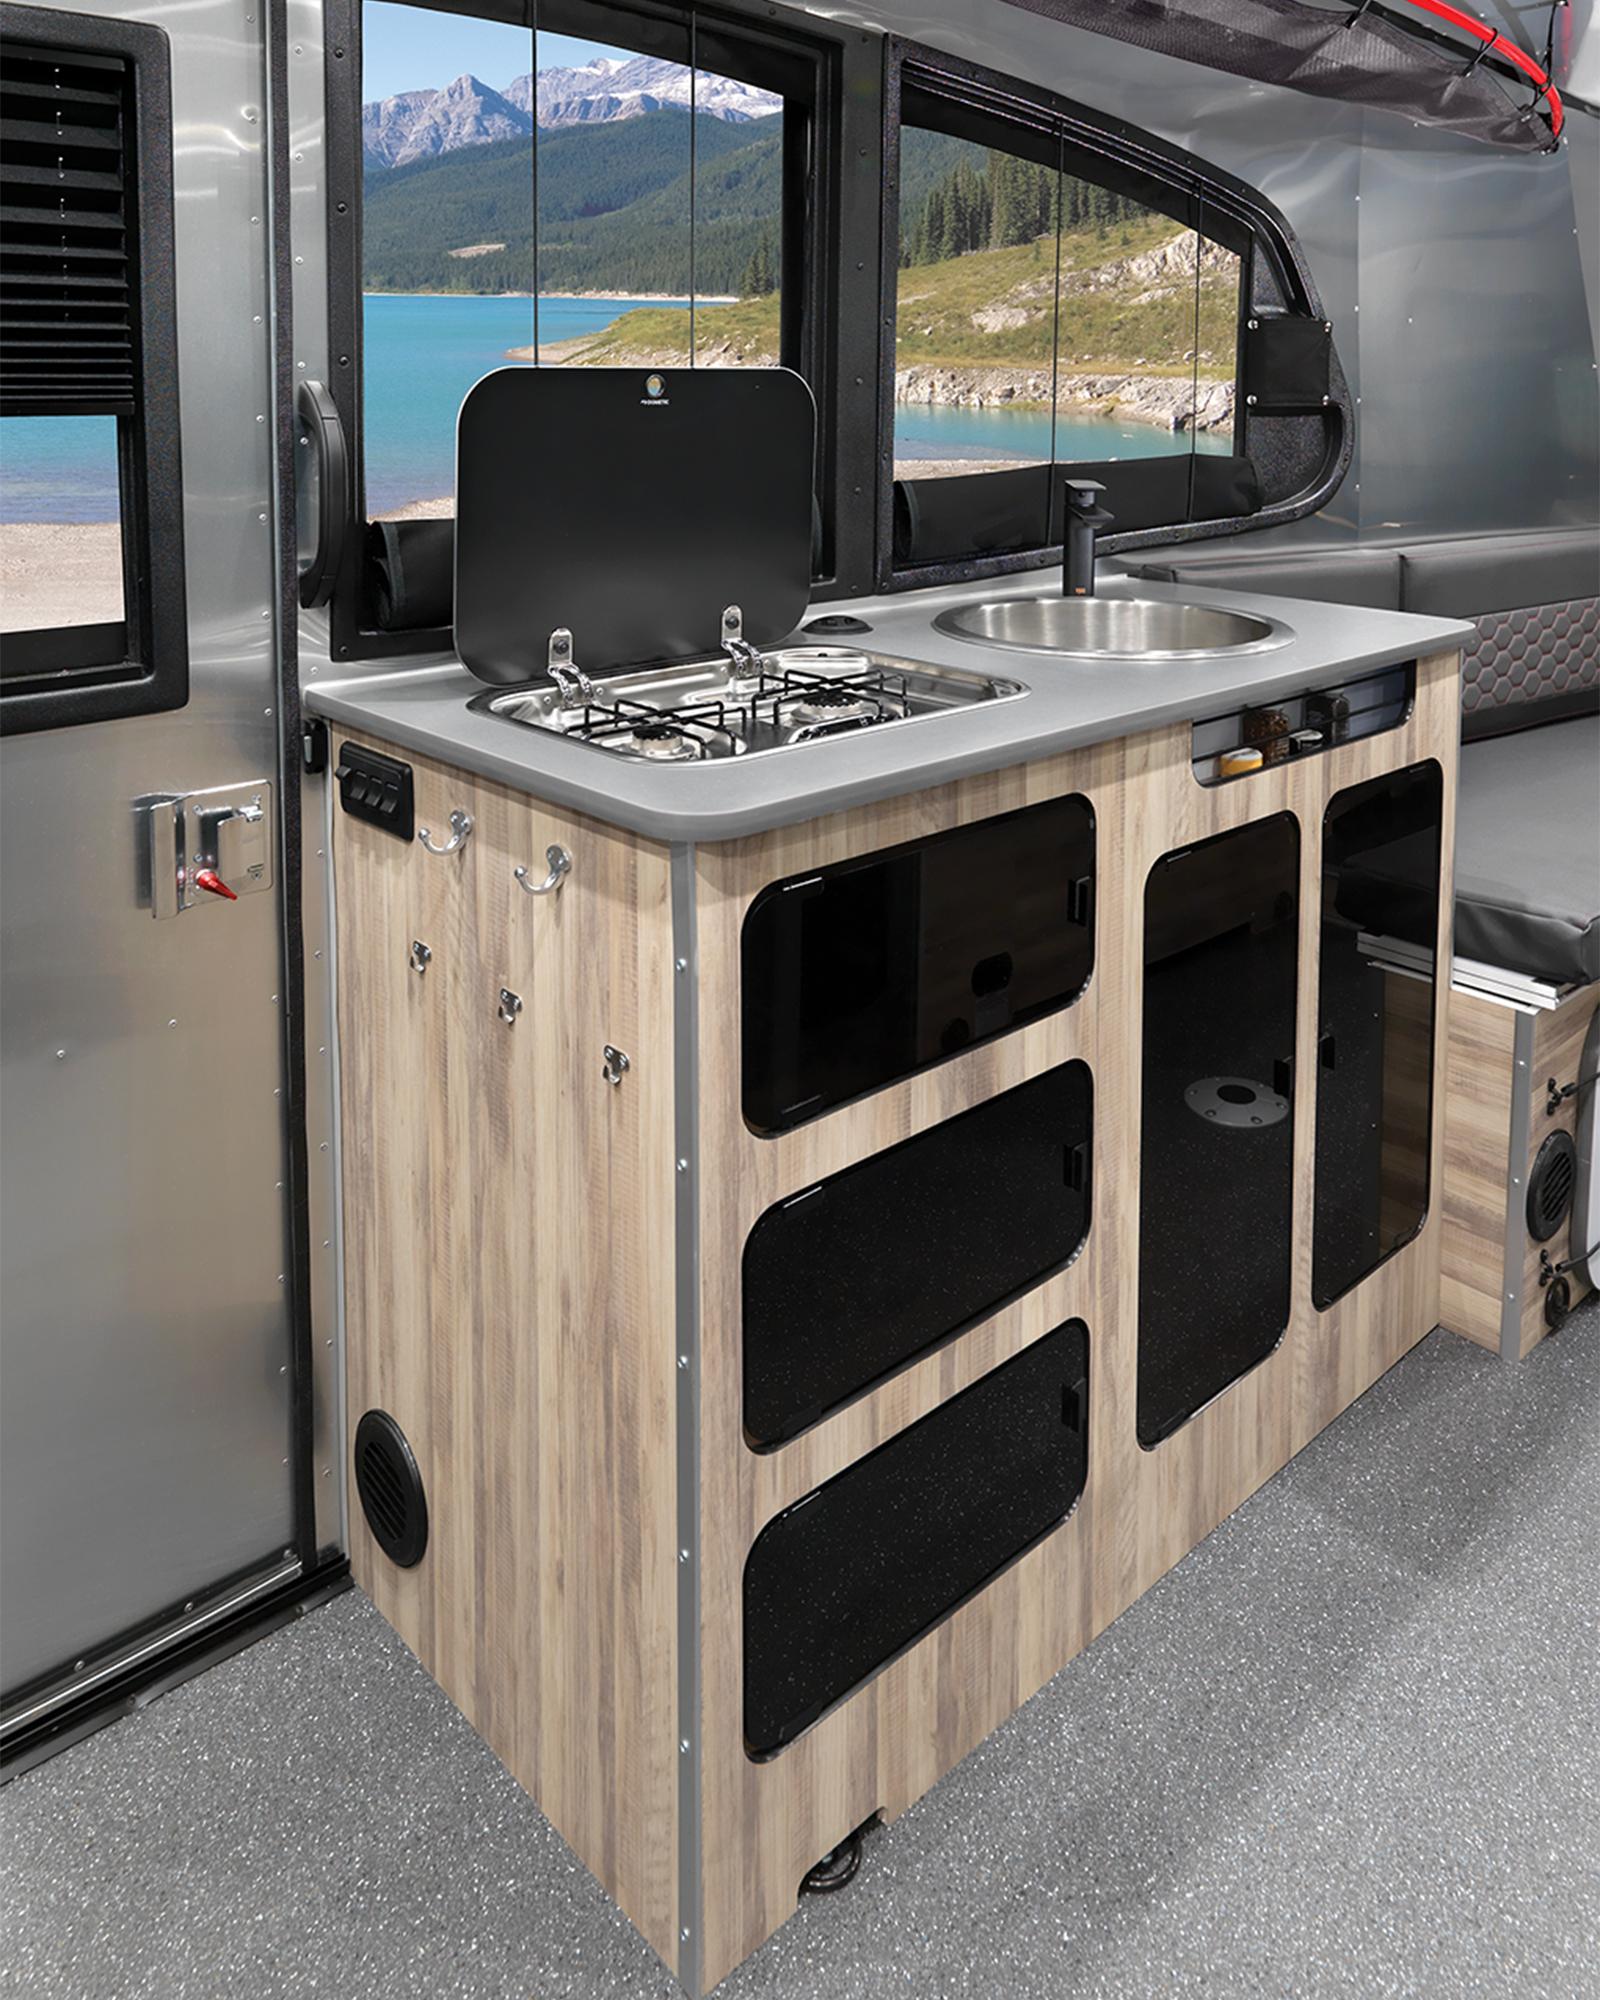 Airstream Basecamp 20 Interior Kitchen